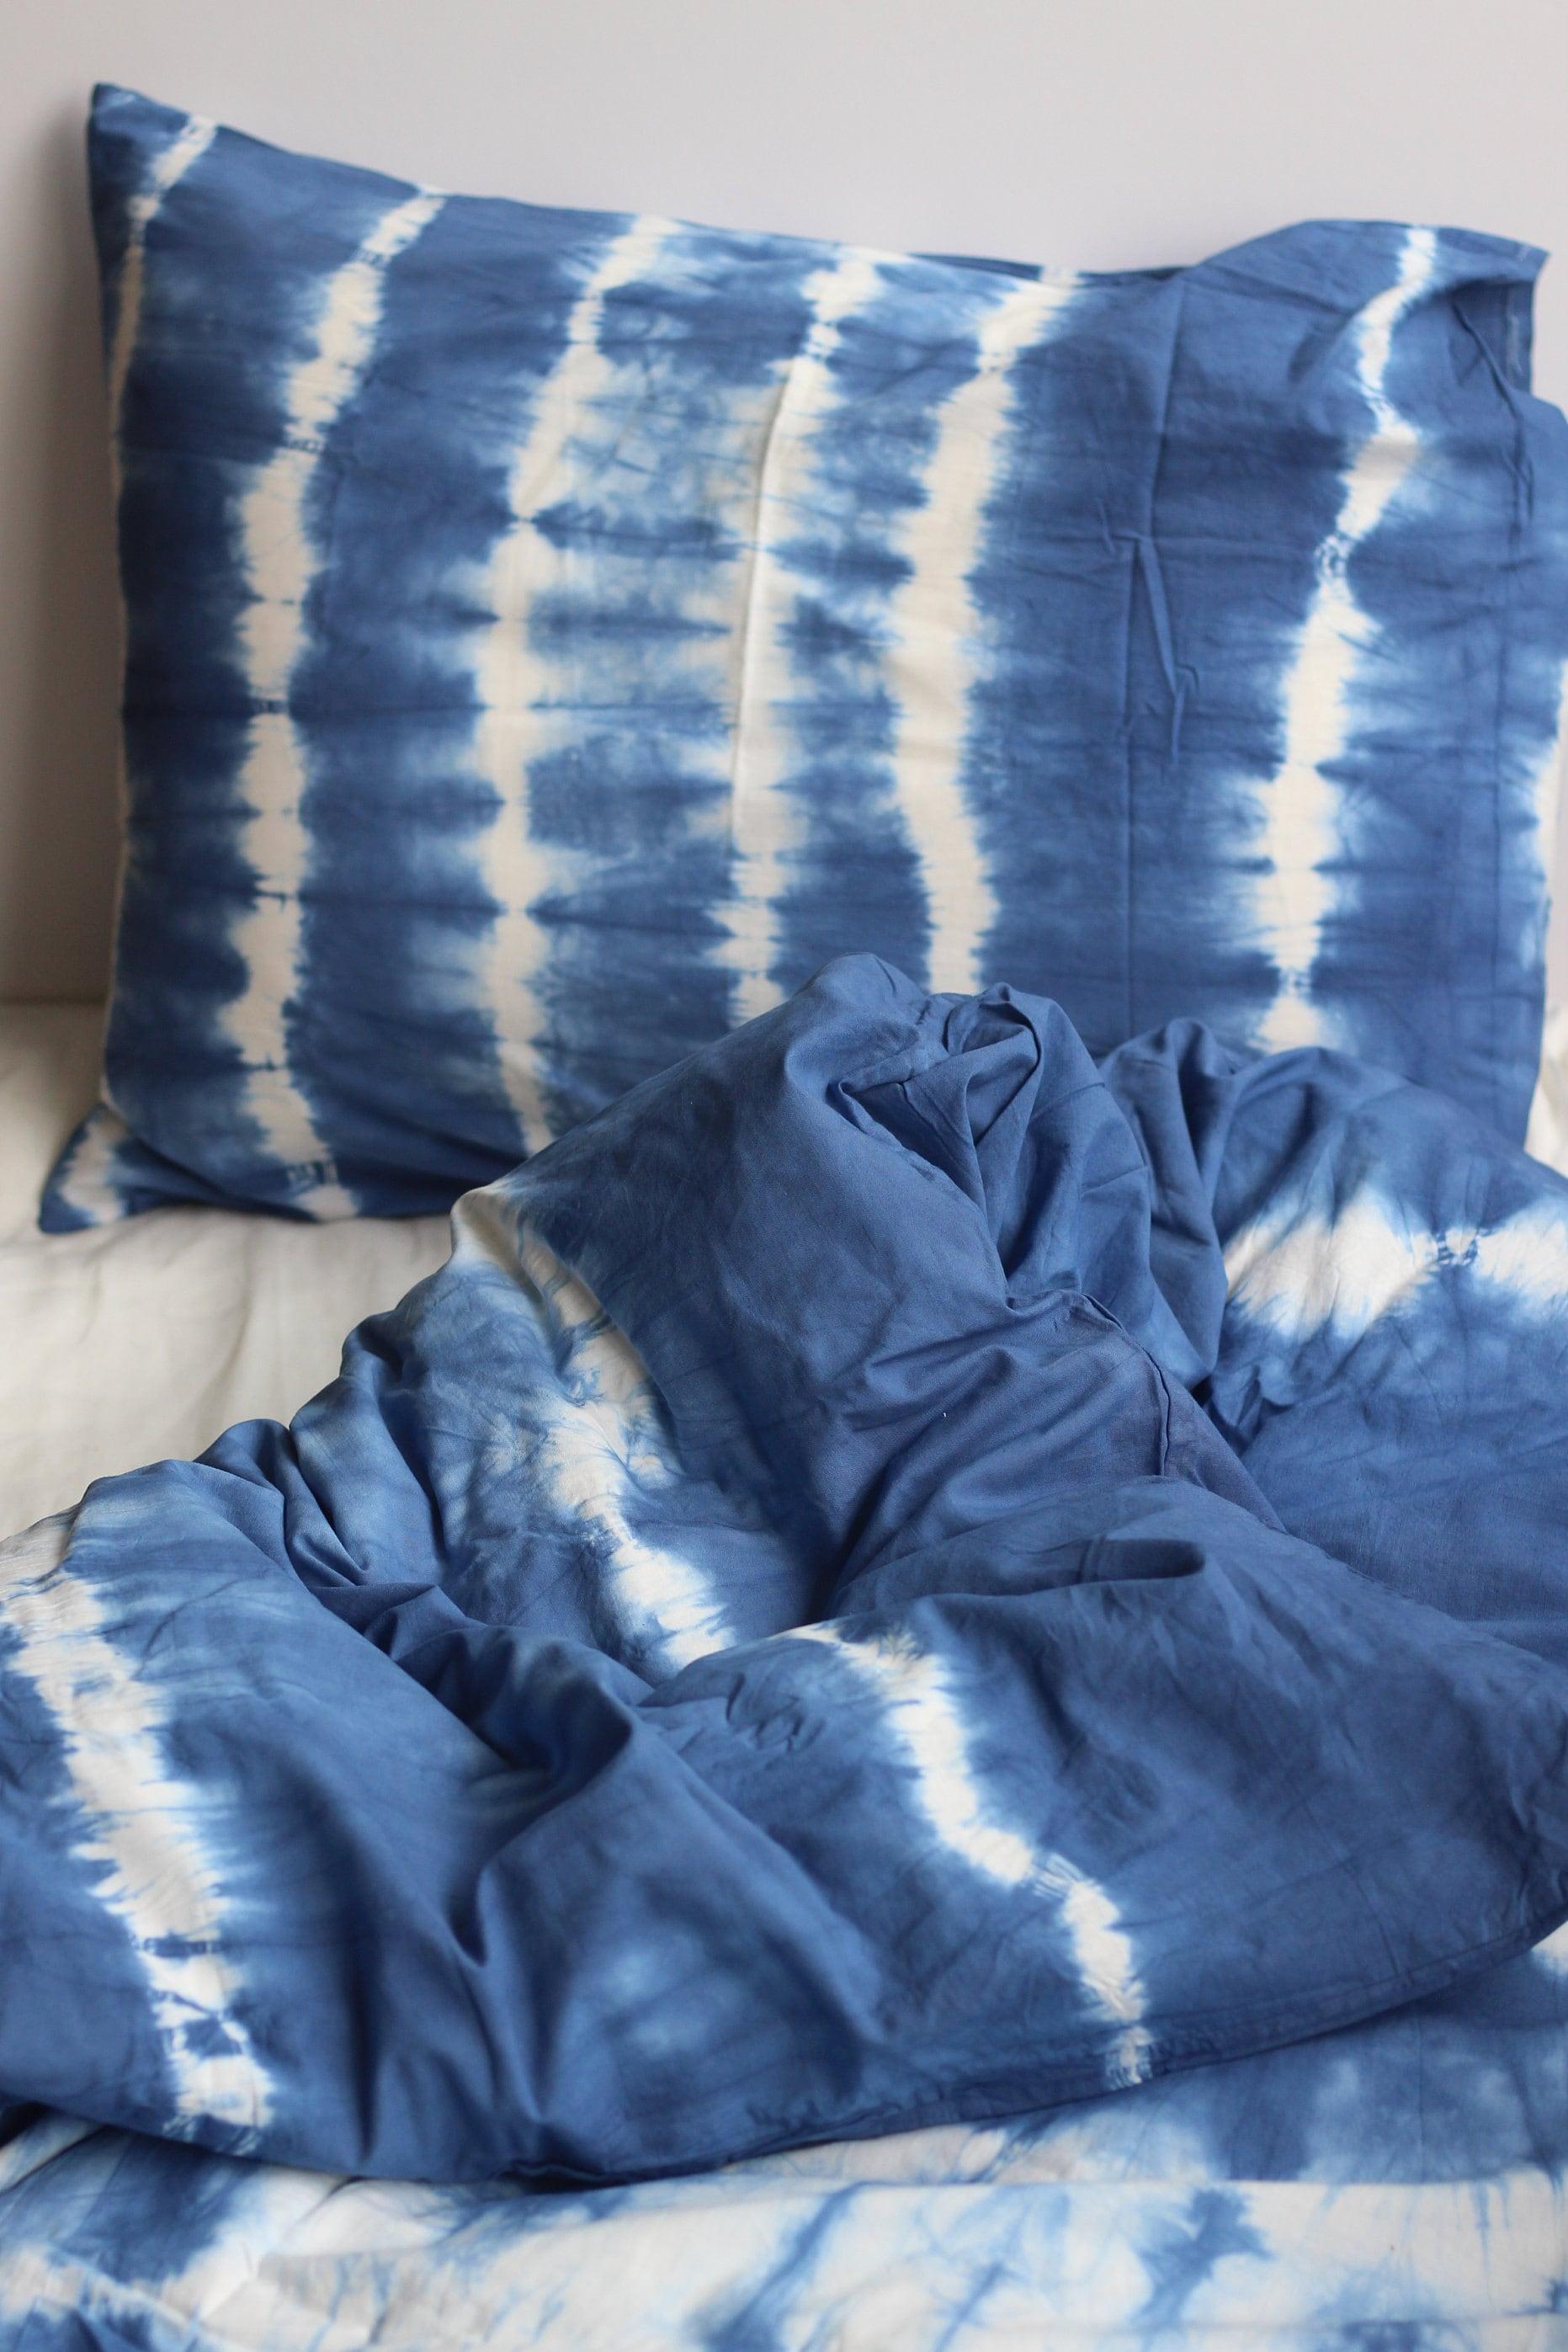 Indigo Tie Dye Bedding Set Queen Shibori Hand Dyed Bedspread with Pillow Covers